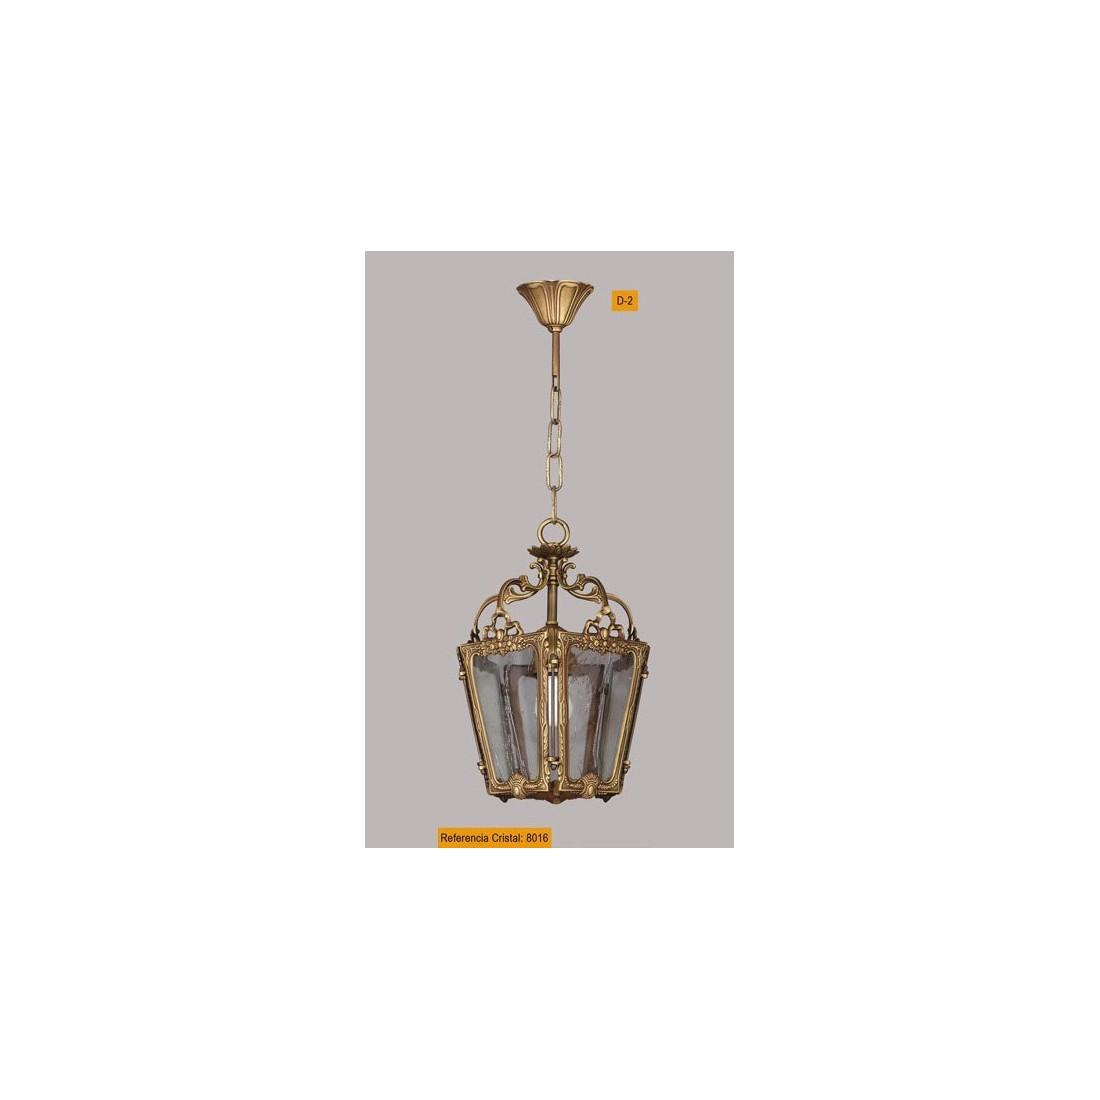 L mpara cl sica de bronce con tulipa de cristal de murano - Lamparas para pasillos casa ...